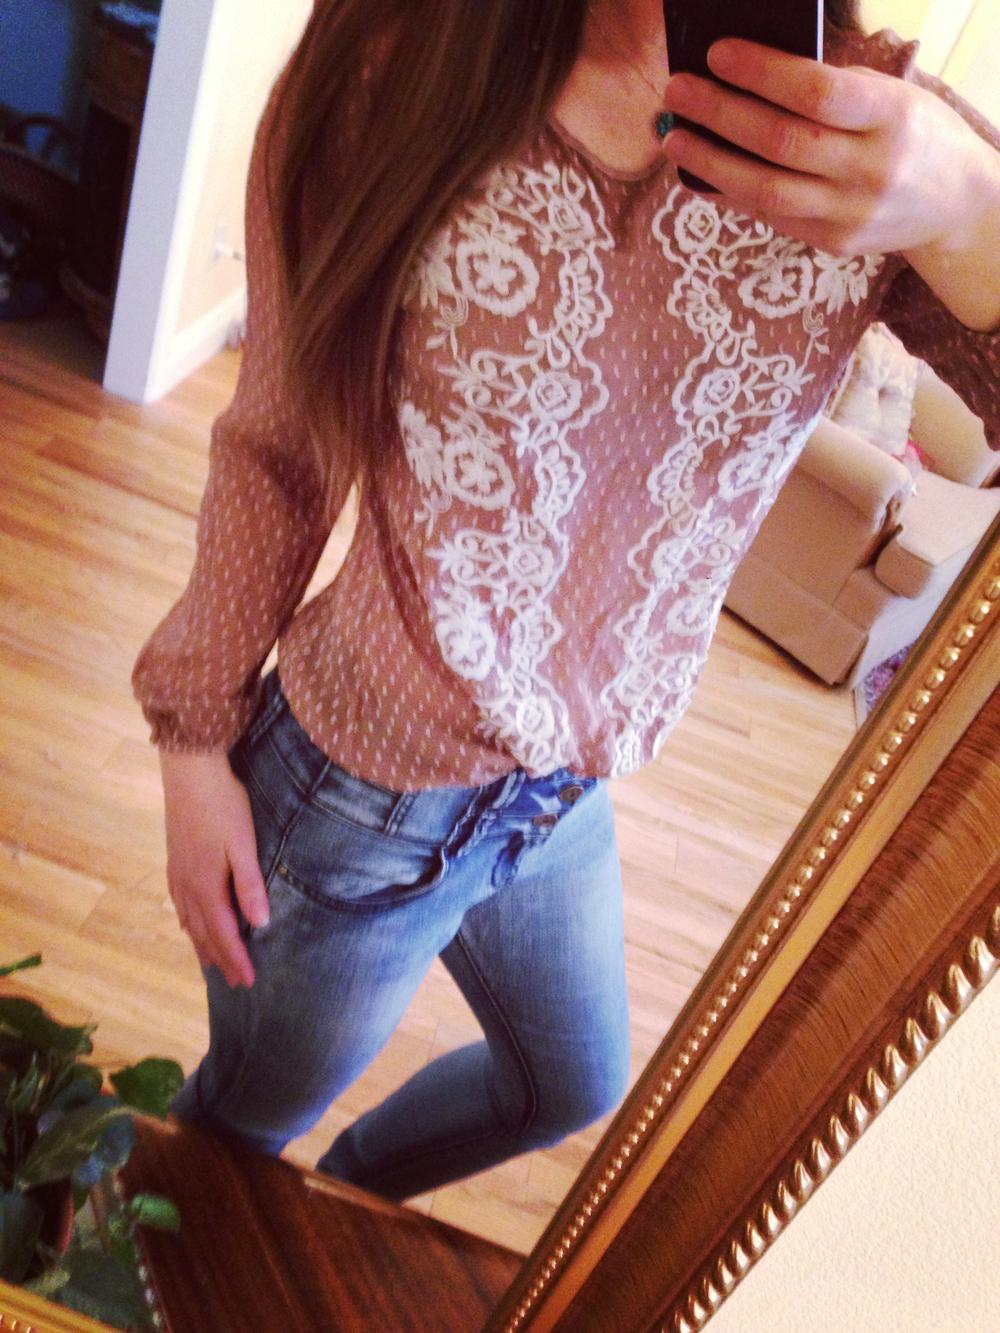 Lace-shirtblog.jpg